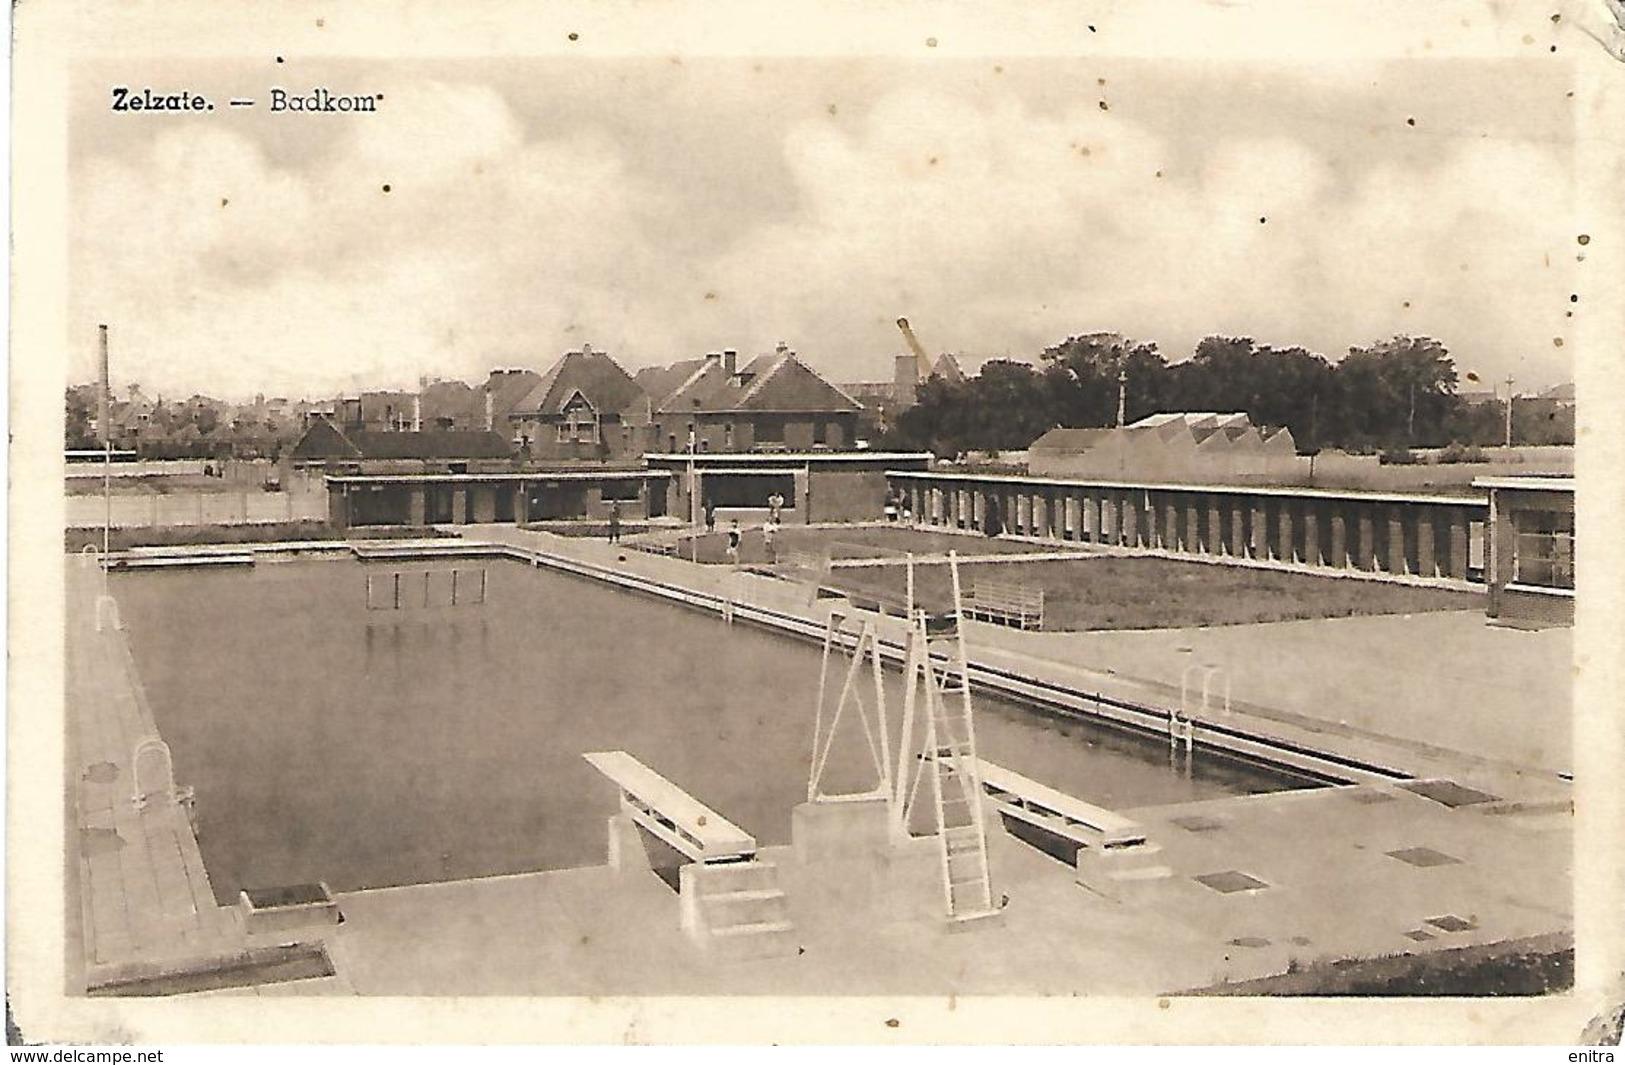 Zelzate - Badkom (openluchtzwembad) - Zelzate